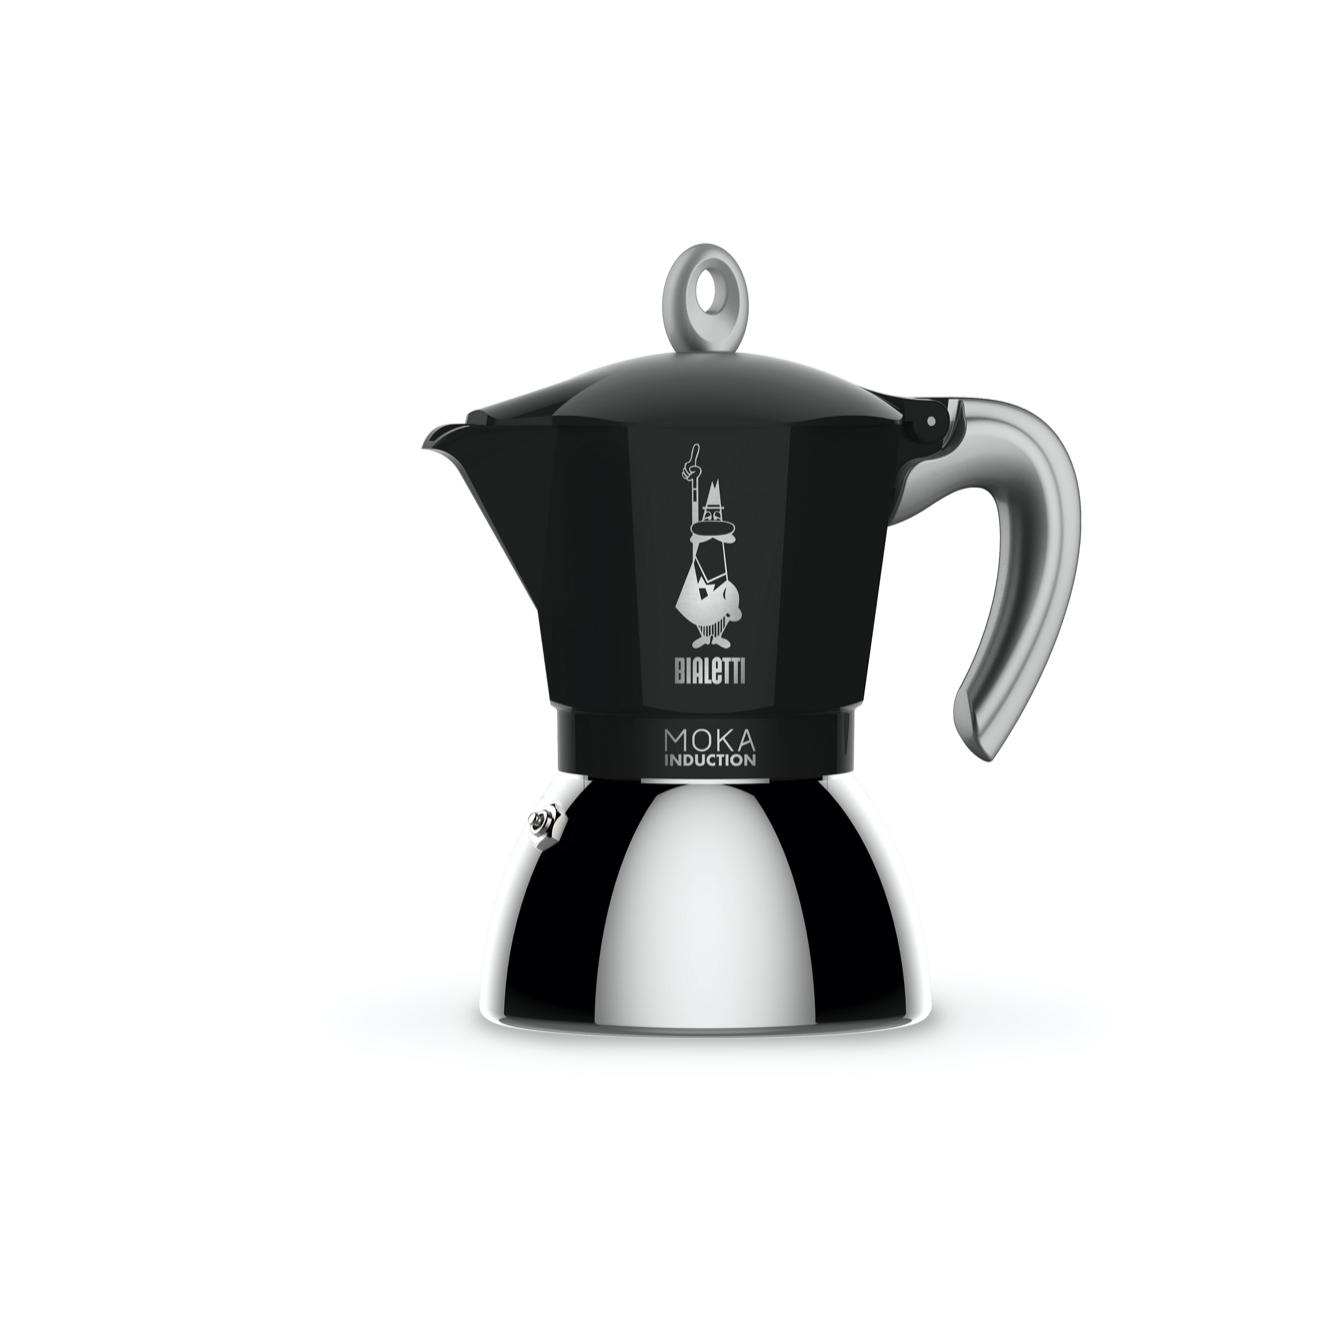 Bialetti - Moka Induction Edition 2.0 - 6 Cups - Black (6936)